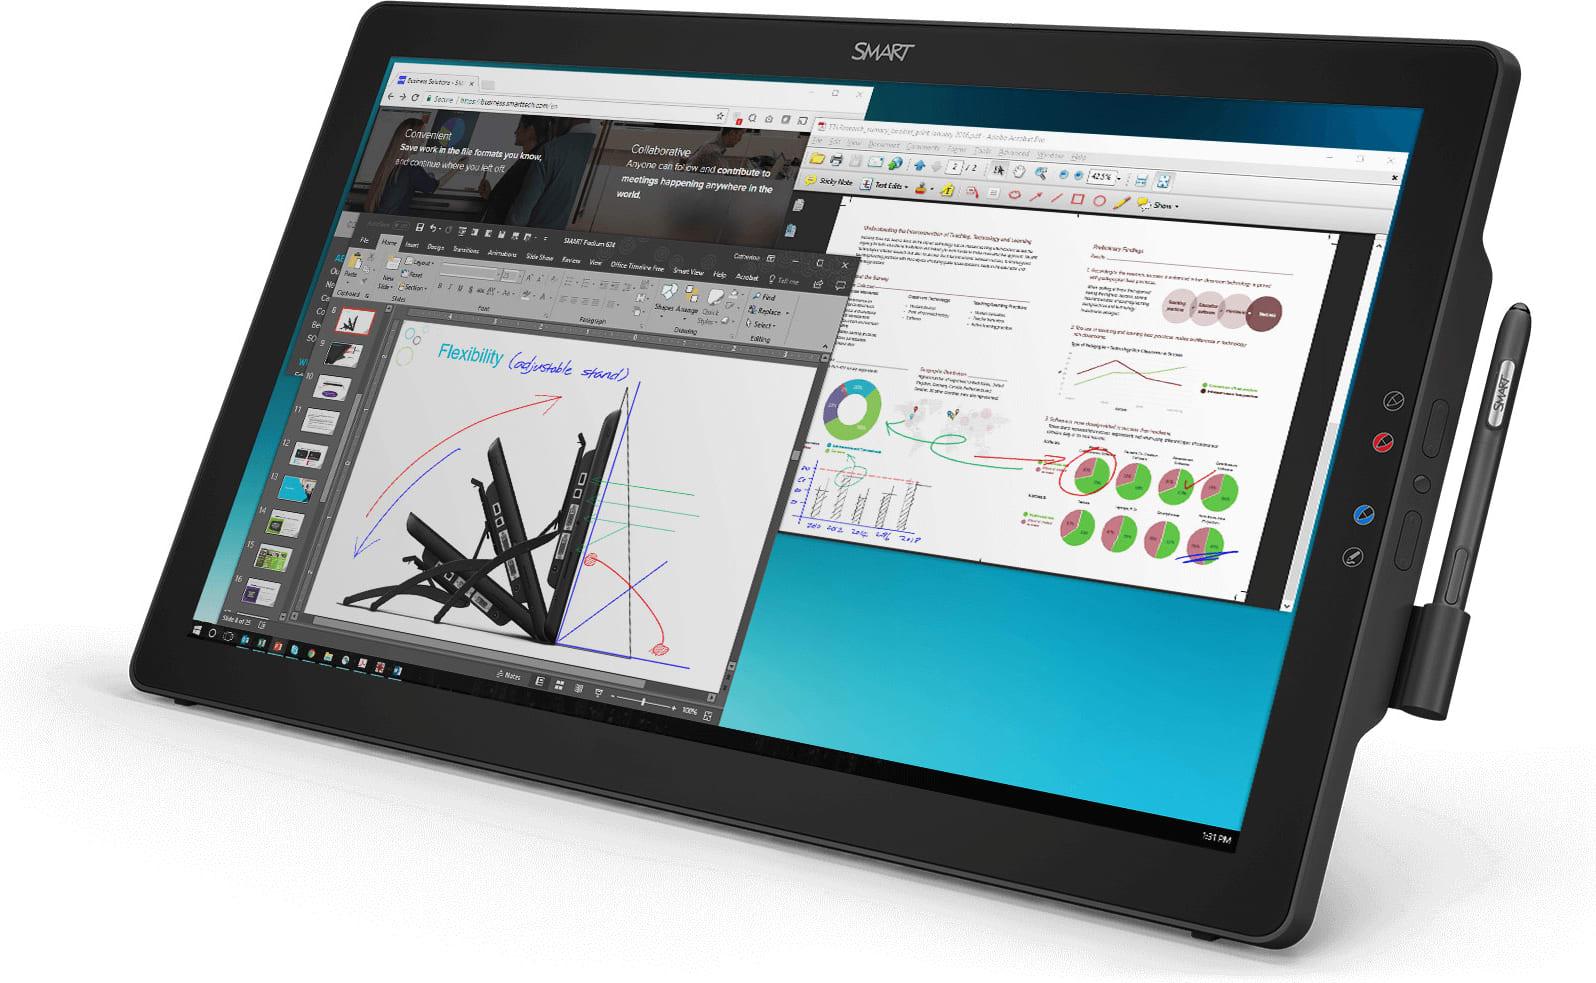 SMARTBOARD SP624P - Podium Interactive Pen Display SP624P with Meeting Pro